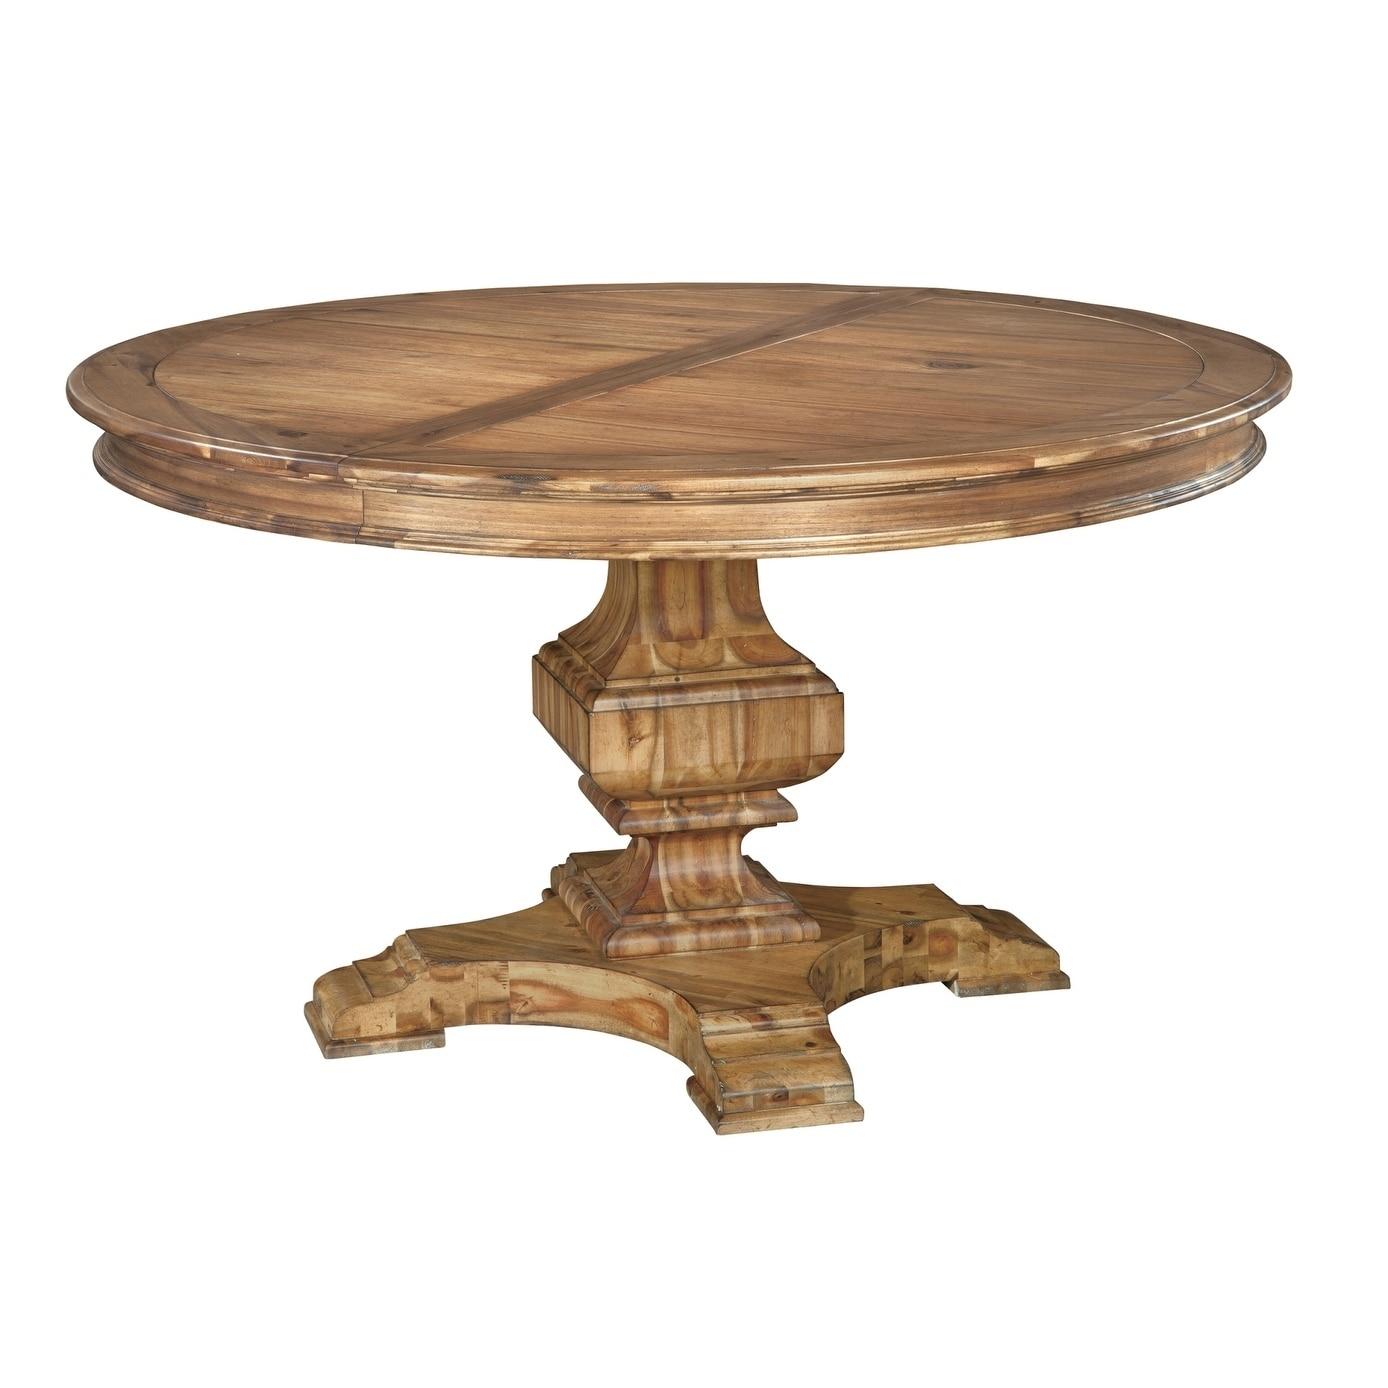 Hekman Furniture Wellington Hall Natural Woodgrain Wood Round Kitchen Dining Table Overstock 24229695